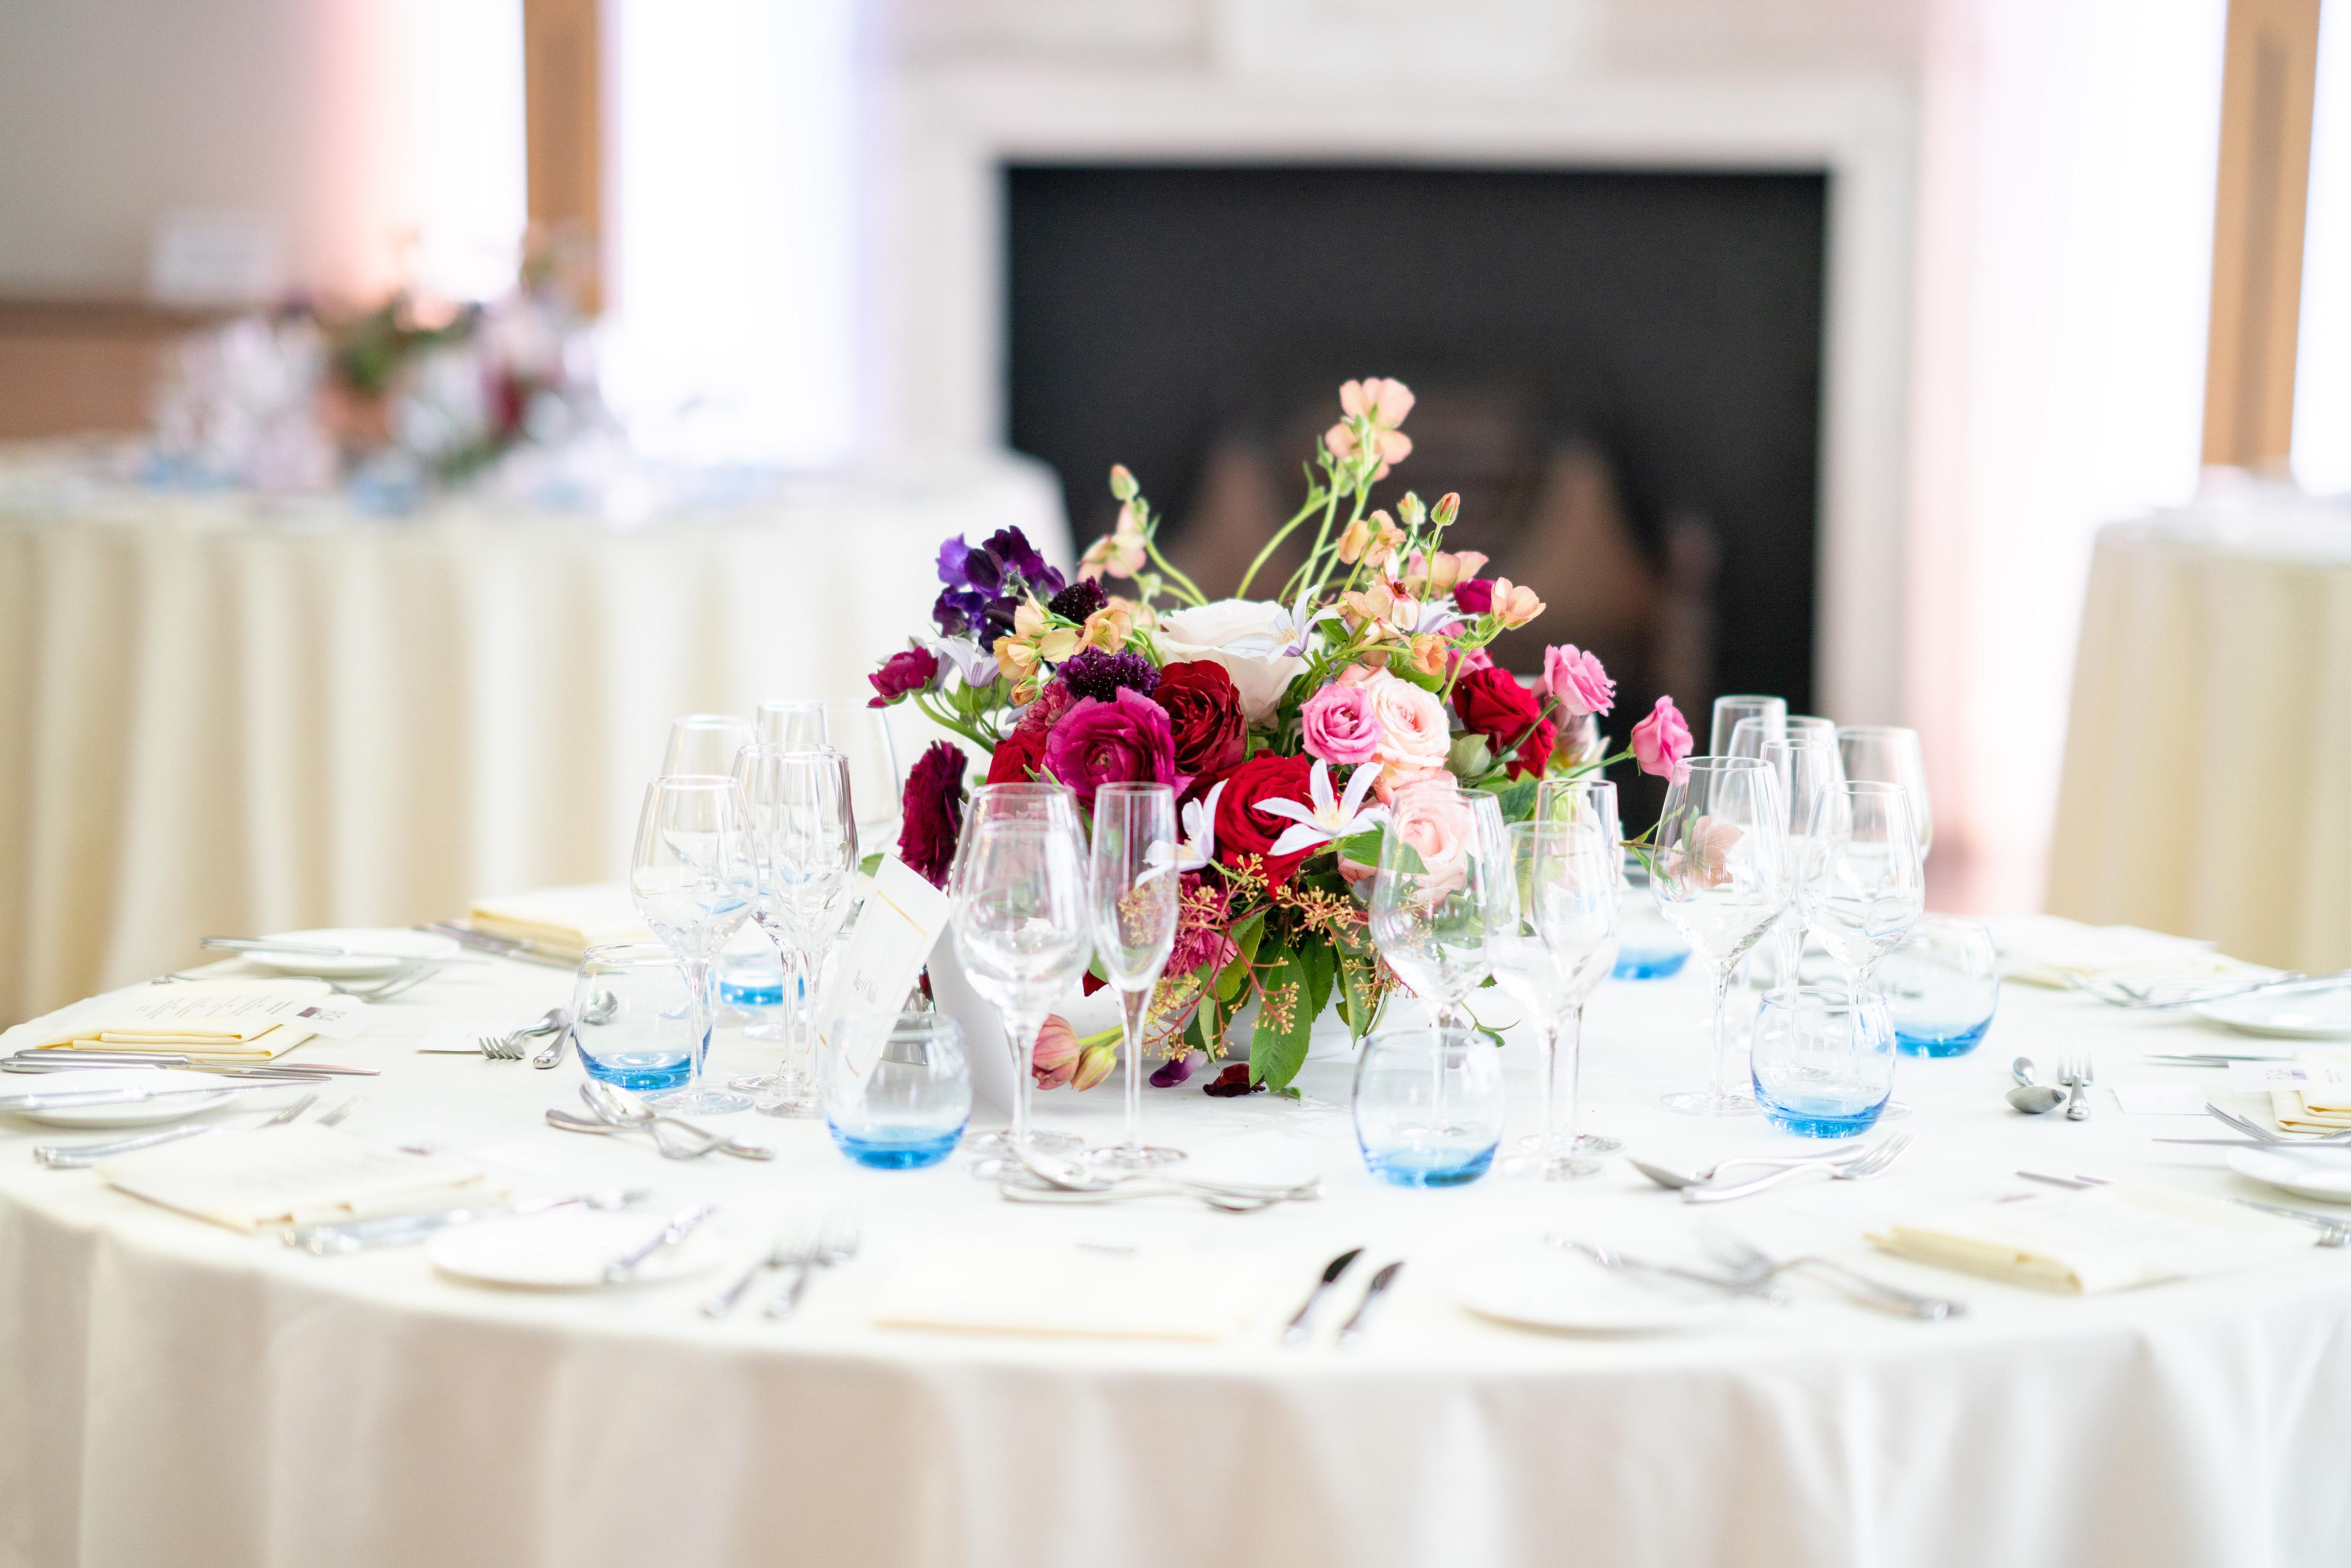 London Wedding Flowers with red roses, purple clematis, and unusual flower varieties